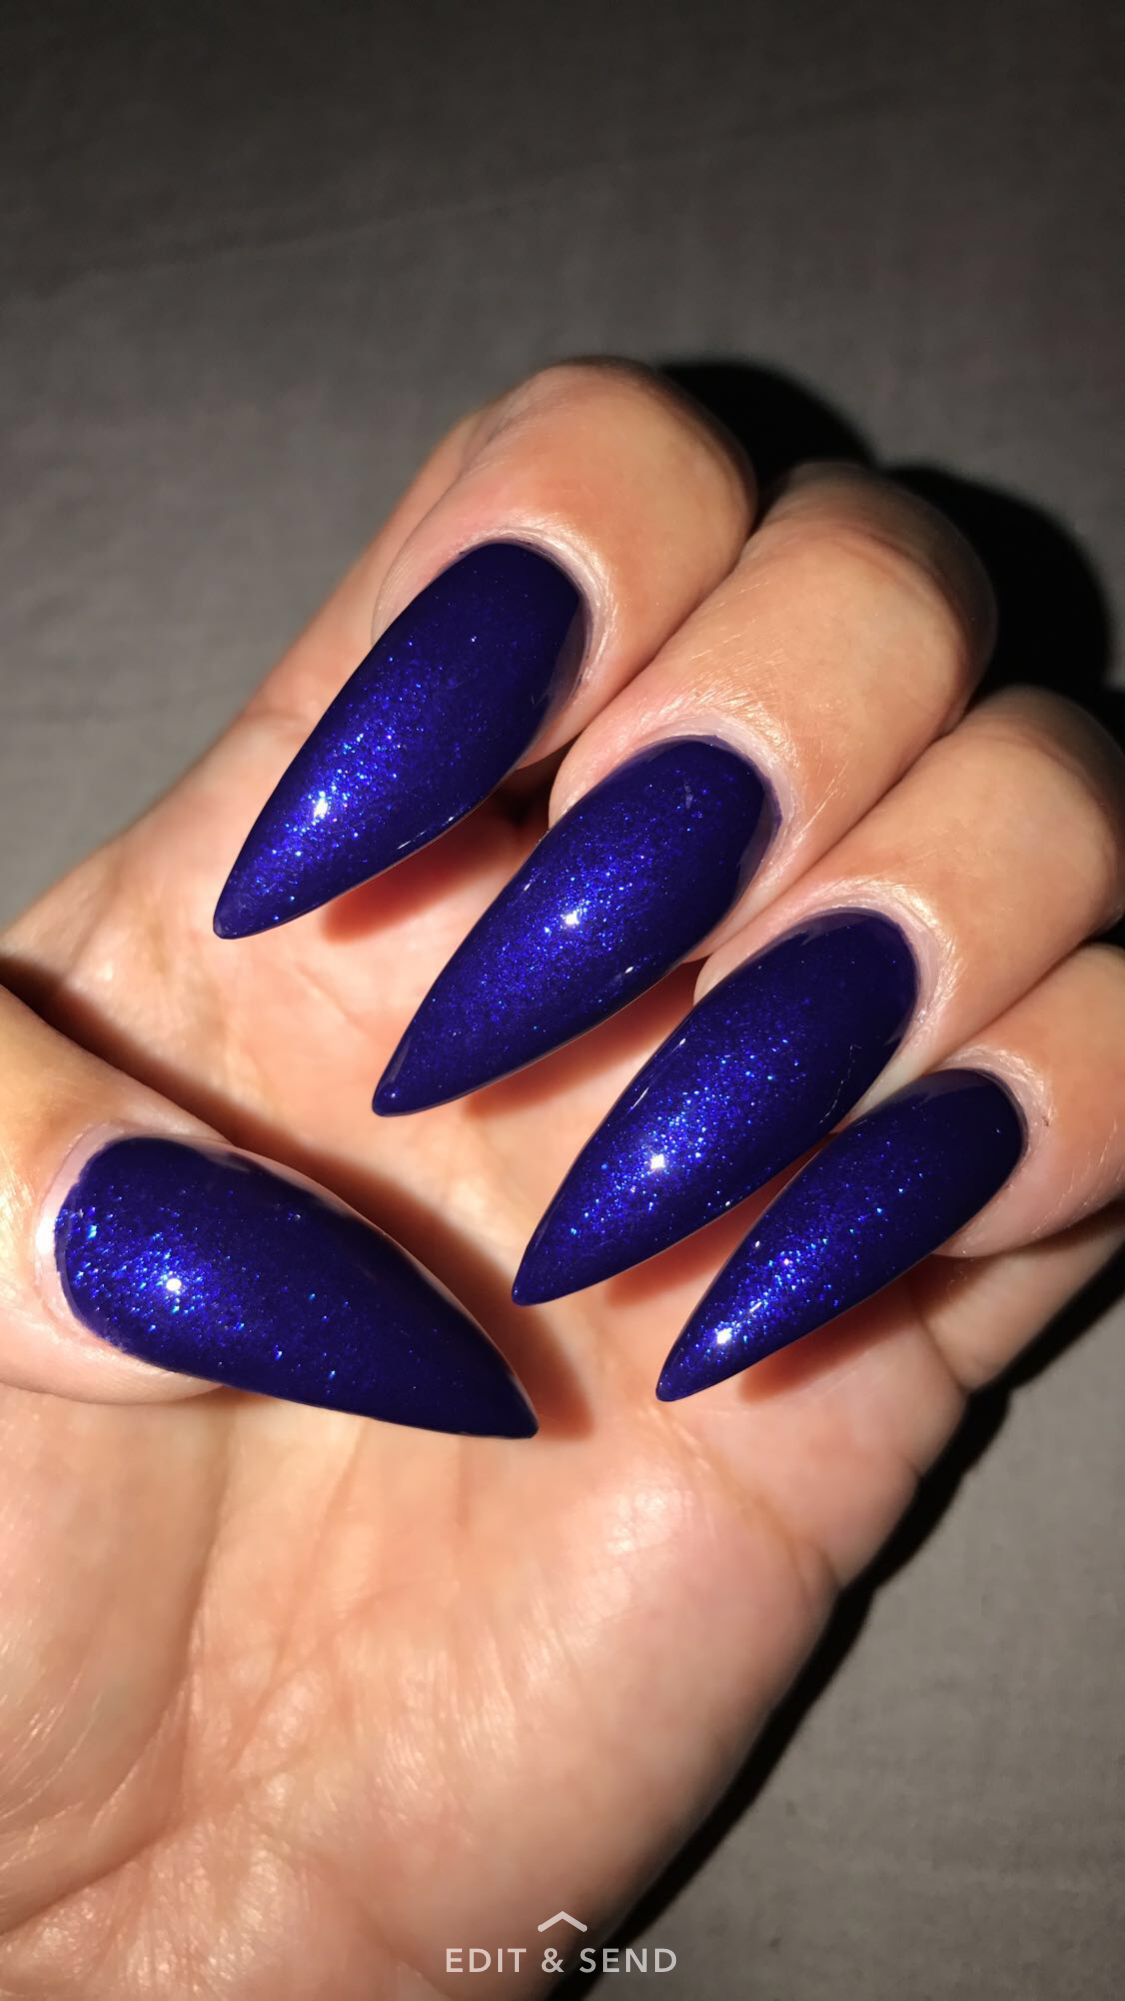 Blue/dark purple Stiletto nails | nails ideas | Pinterest | Purple ...